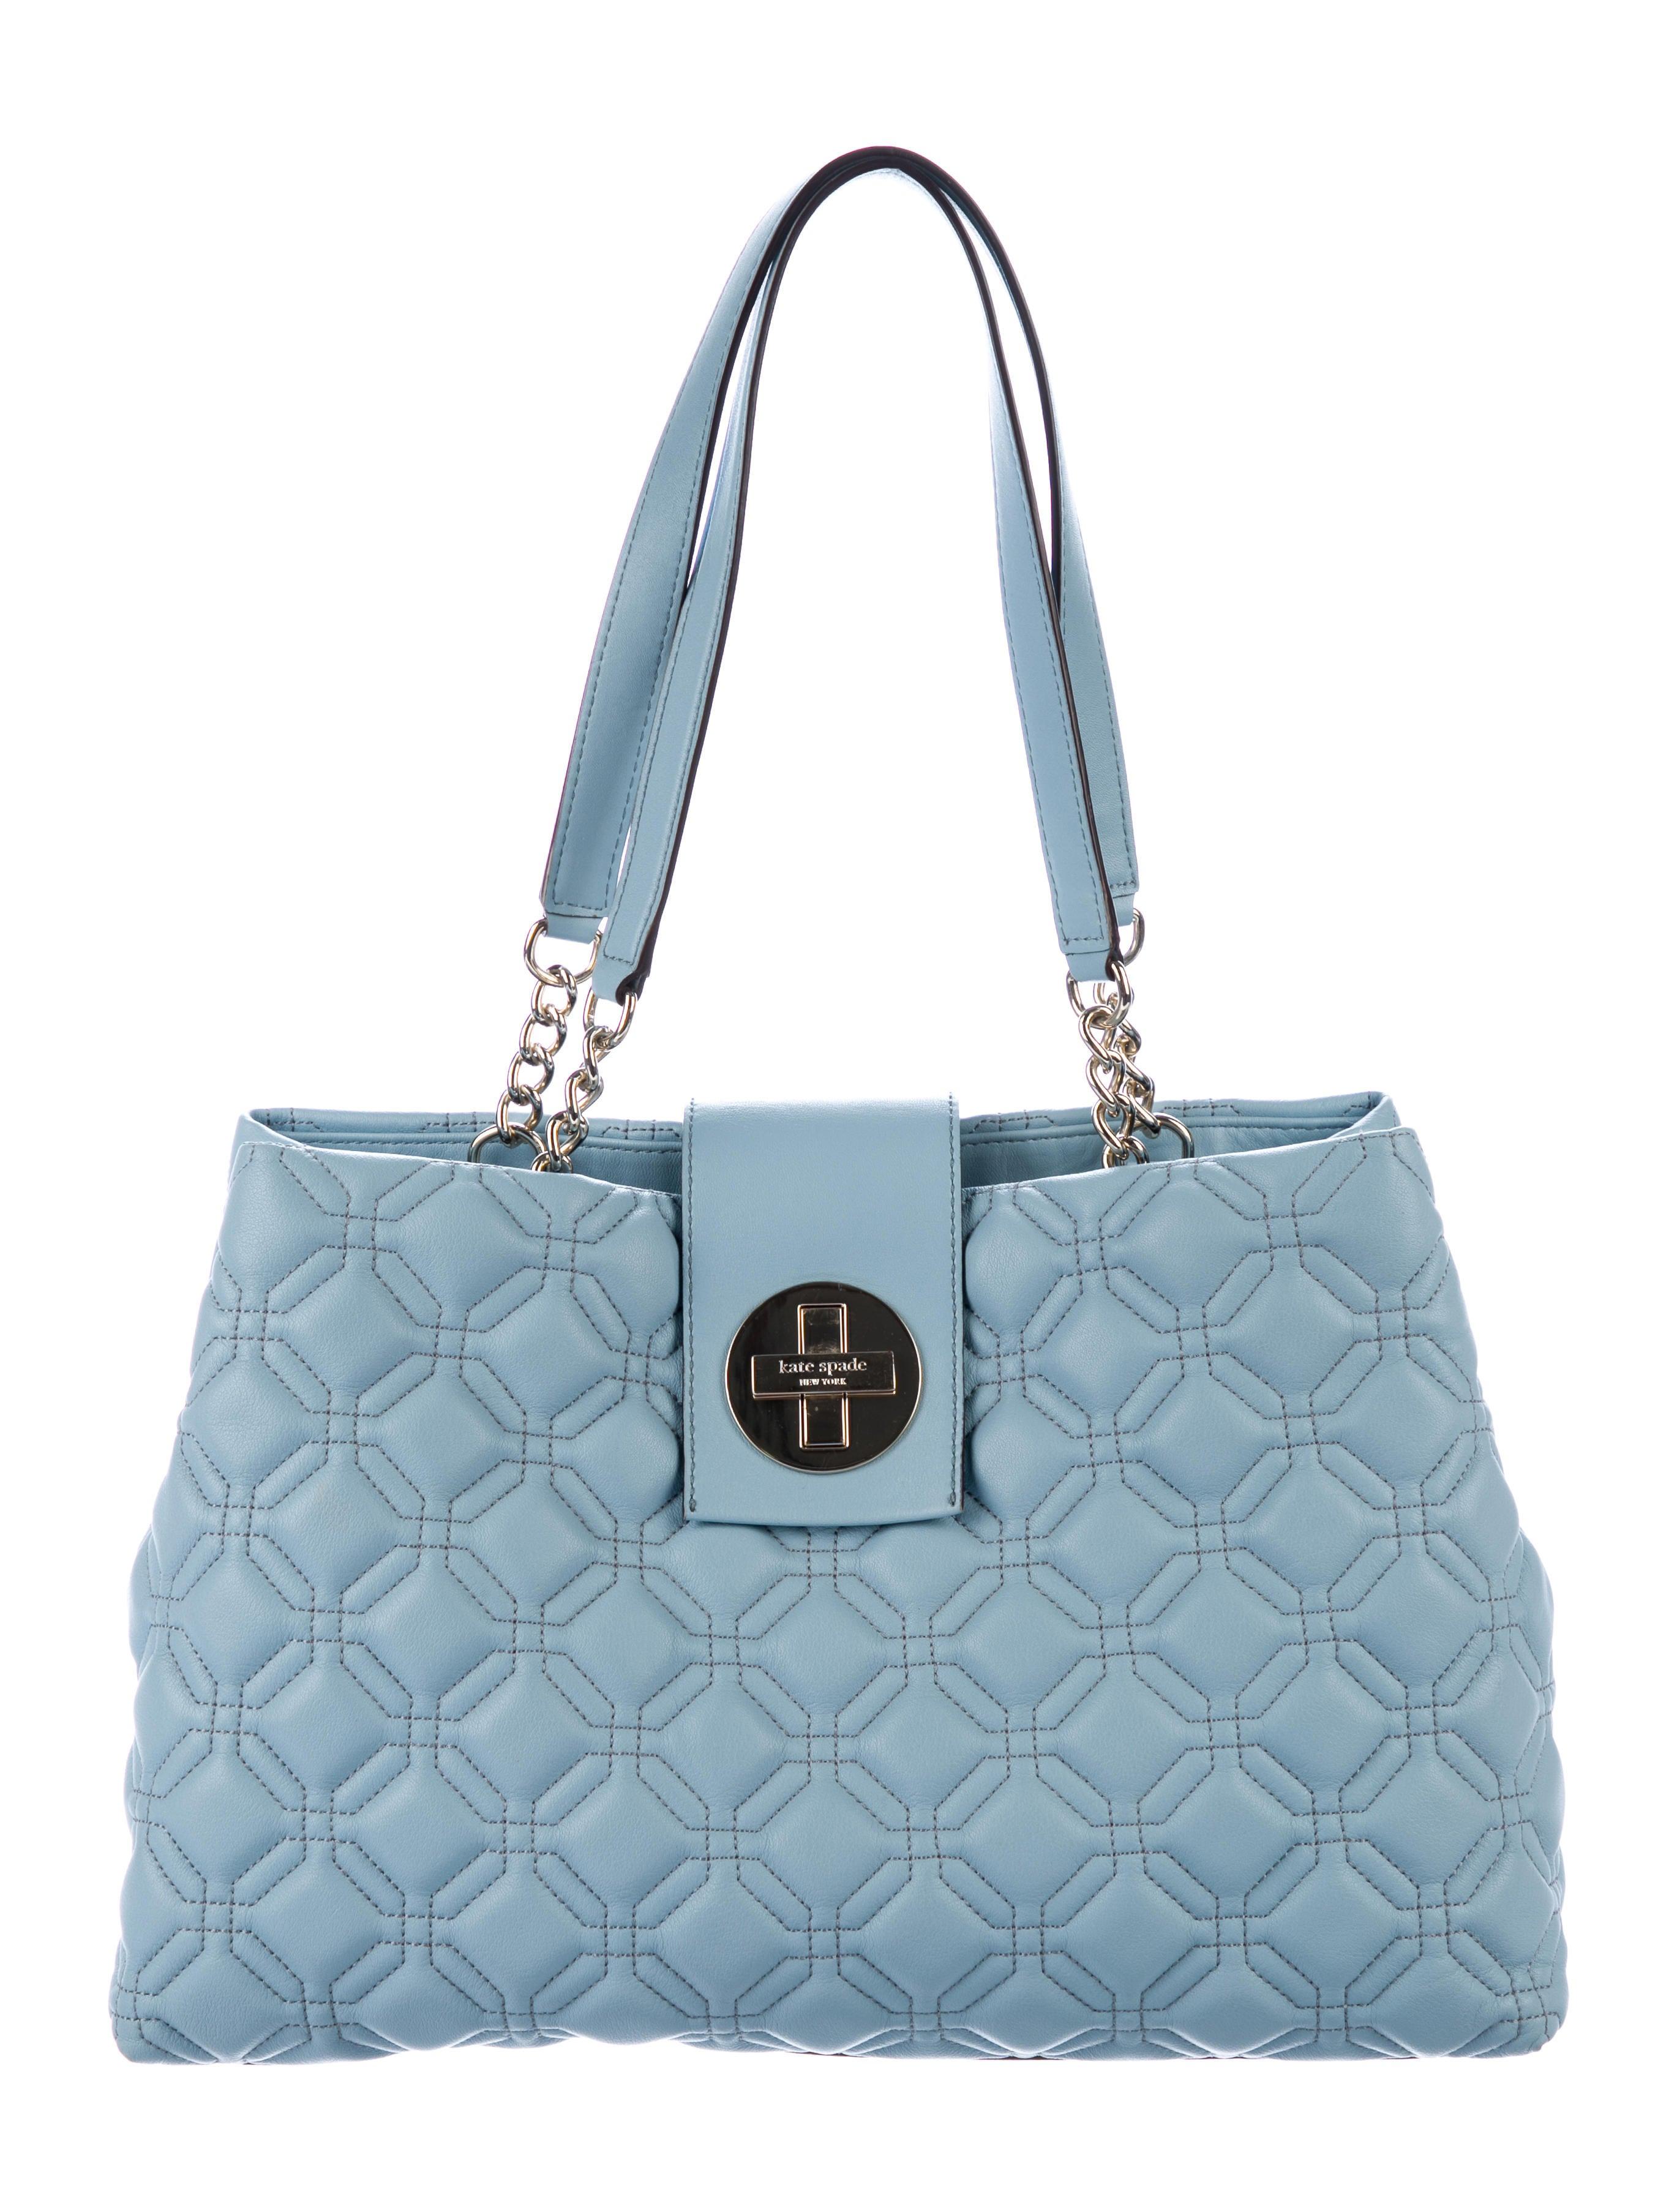 a133d1c36fcd Kate Spade New York Wedgewood Astor Court Elena Tote - Handbags ...